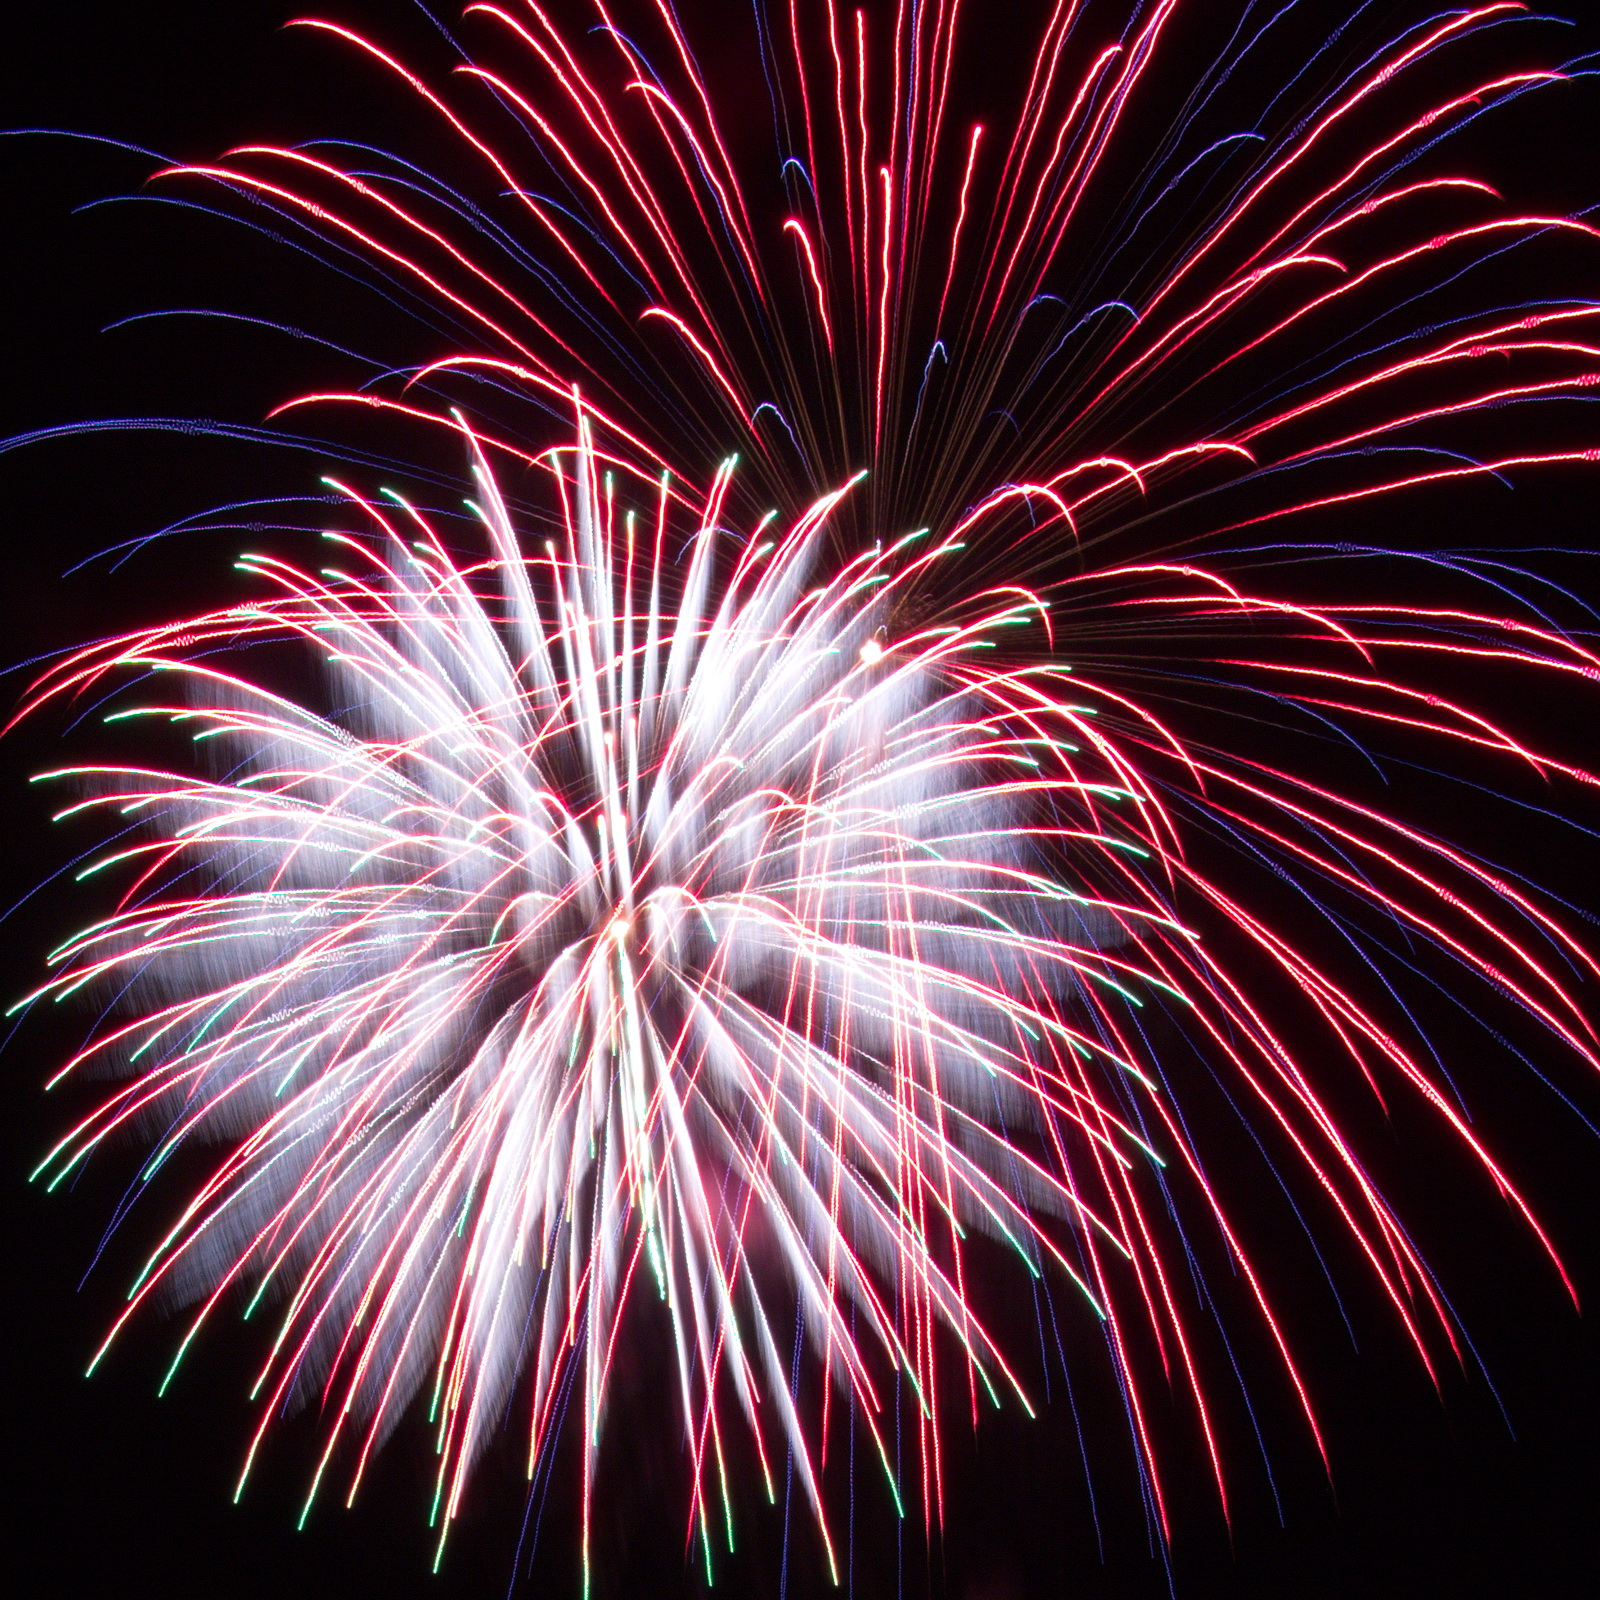 Red, White and Blue Massachusetts Fireworks: